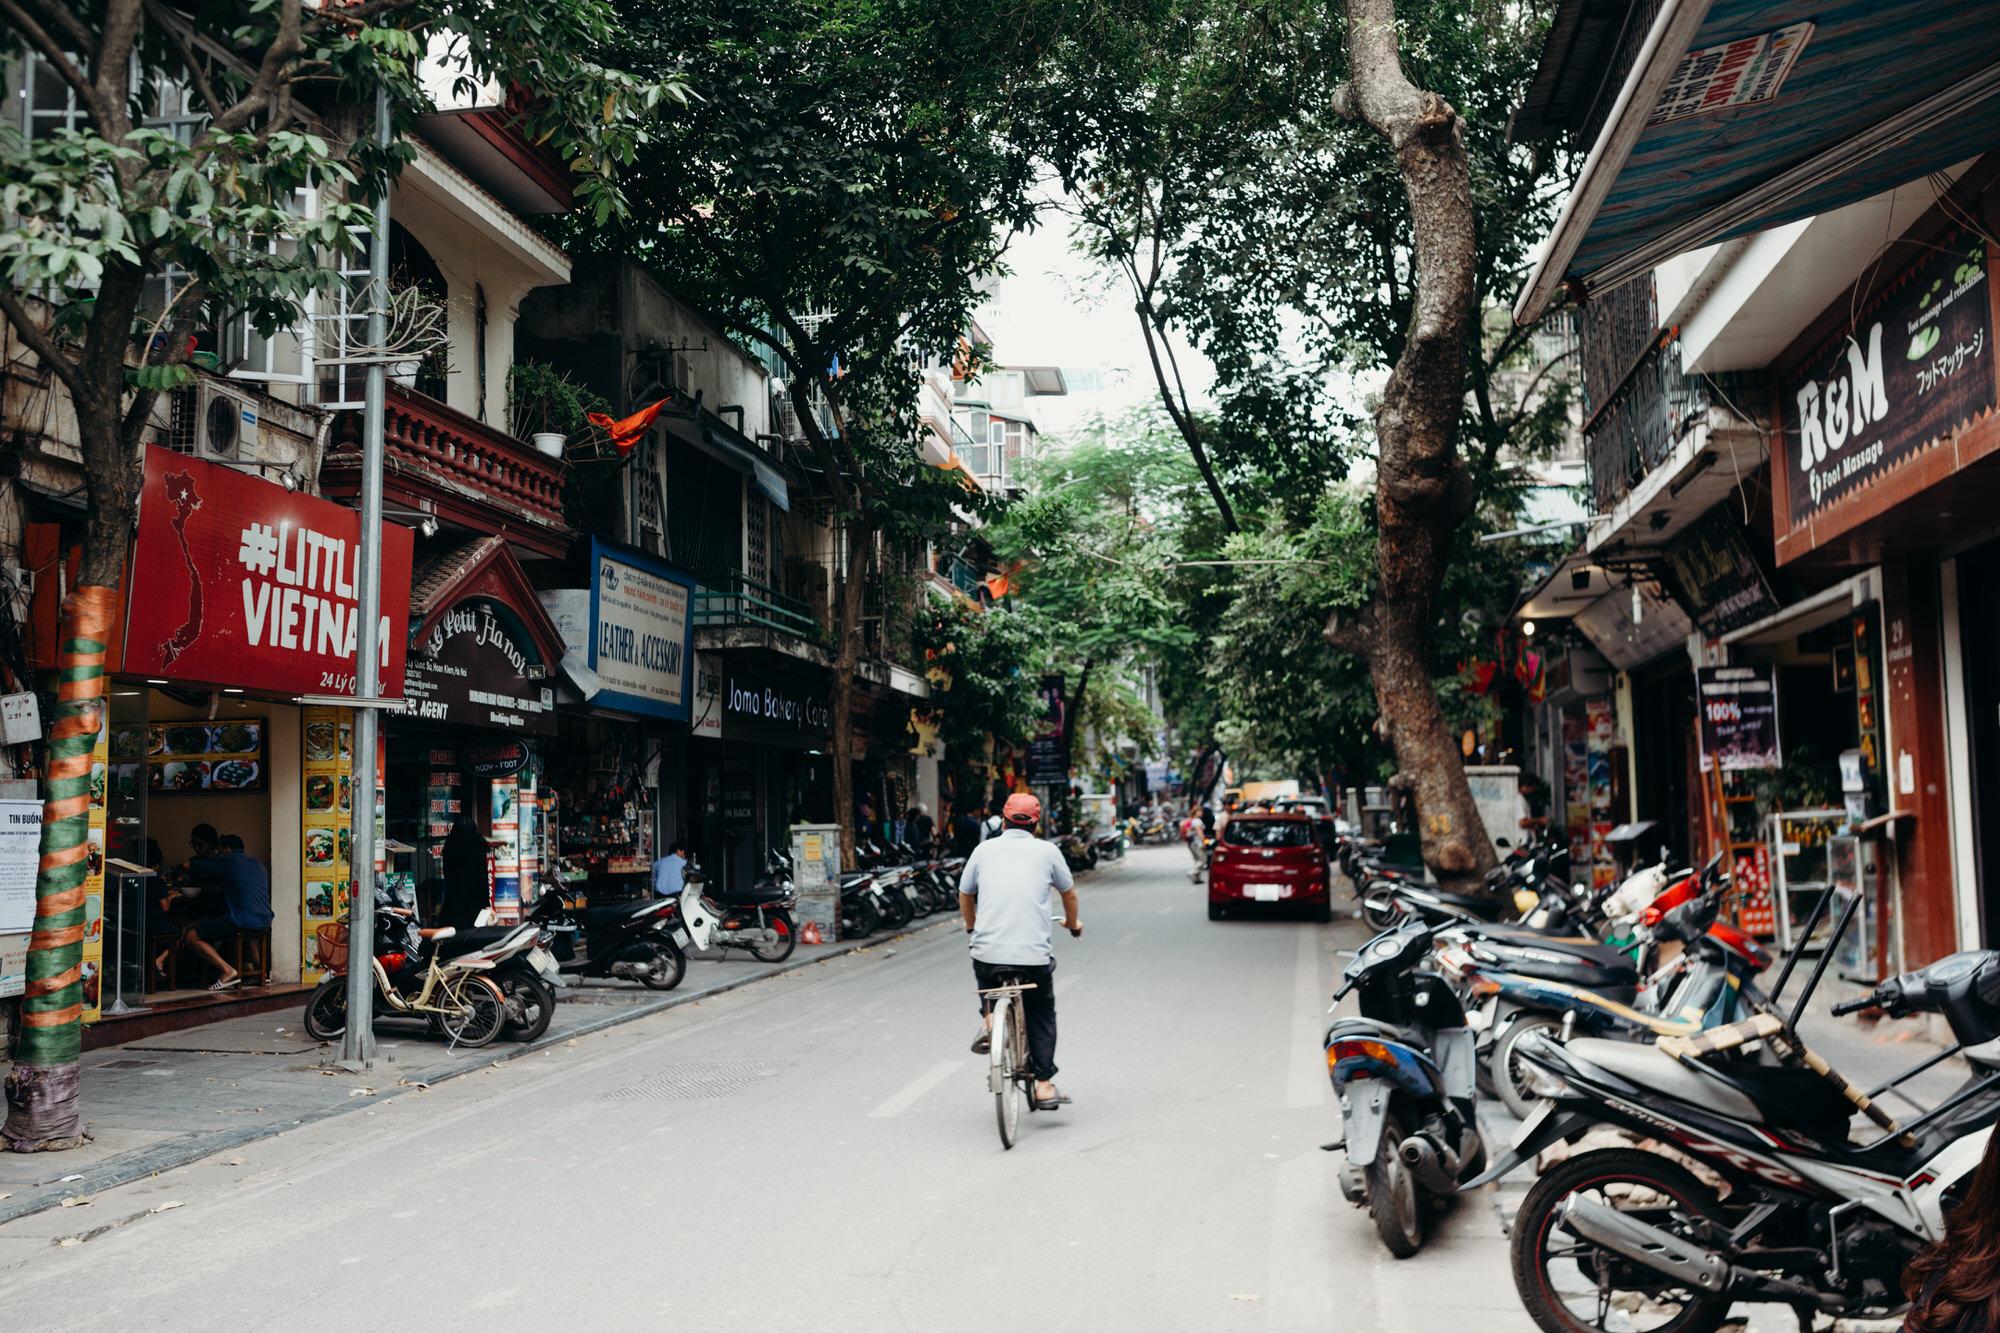 hanoivietnamcitytravelblog-9752-1.jpg